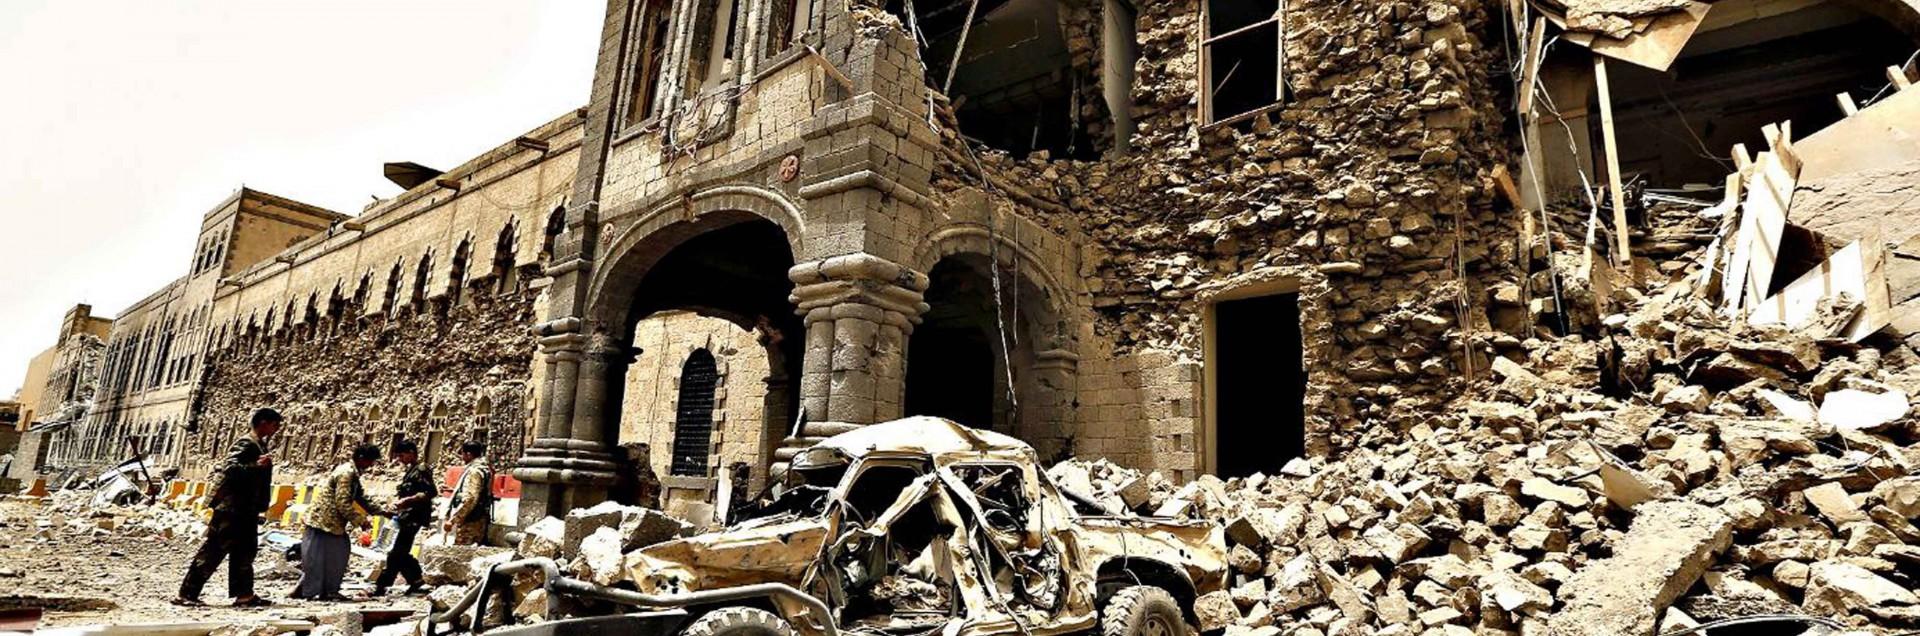 Perché Gentiloni permette<br> i massacri sauditi in Yemen?